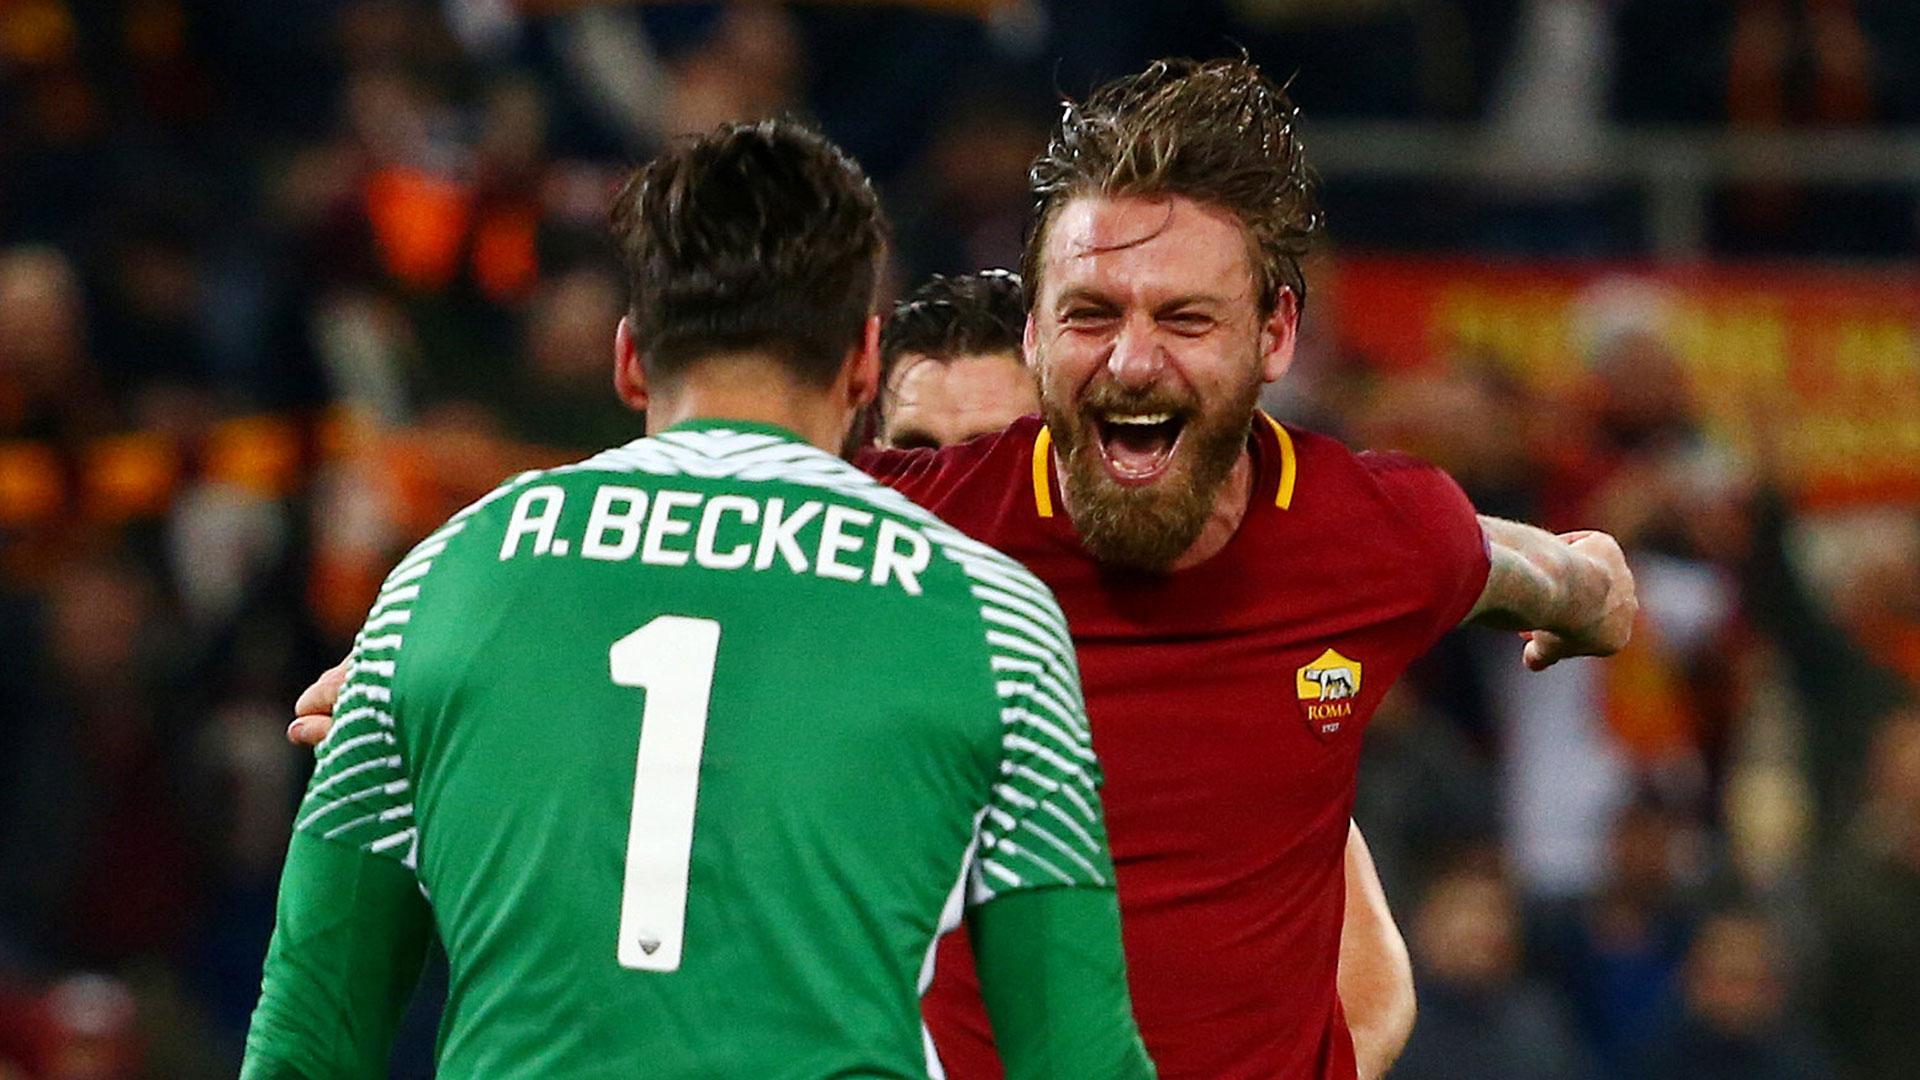 Hist rica eliminaci n del barcelona cay 3 0 ante la roma - Los italianos barcelona ...